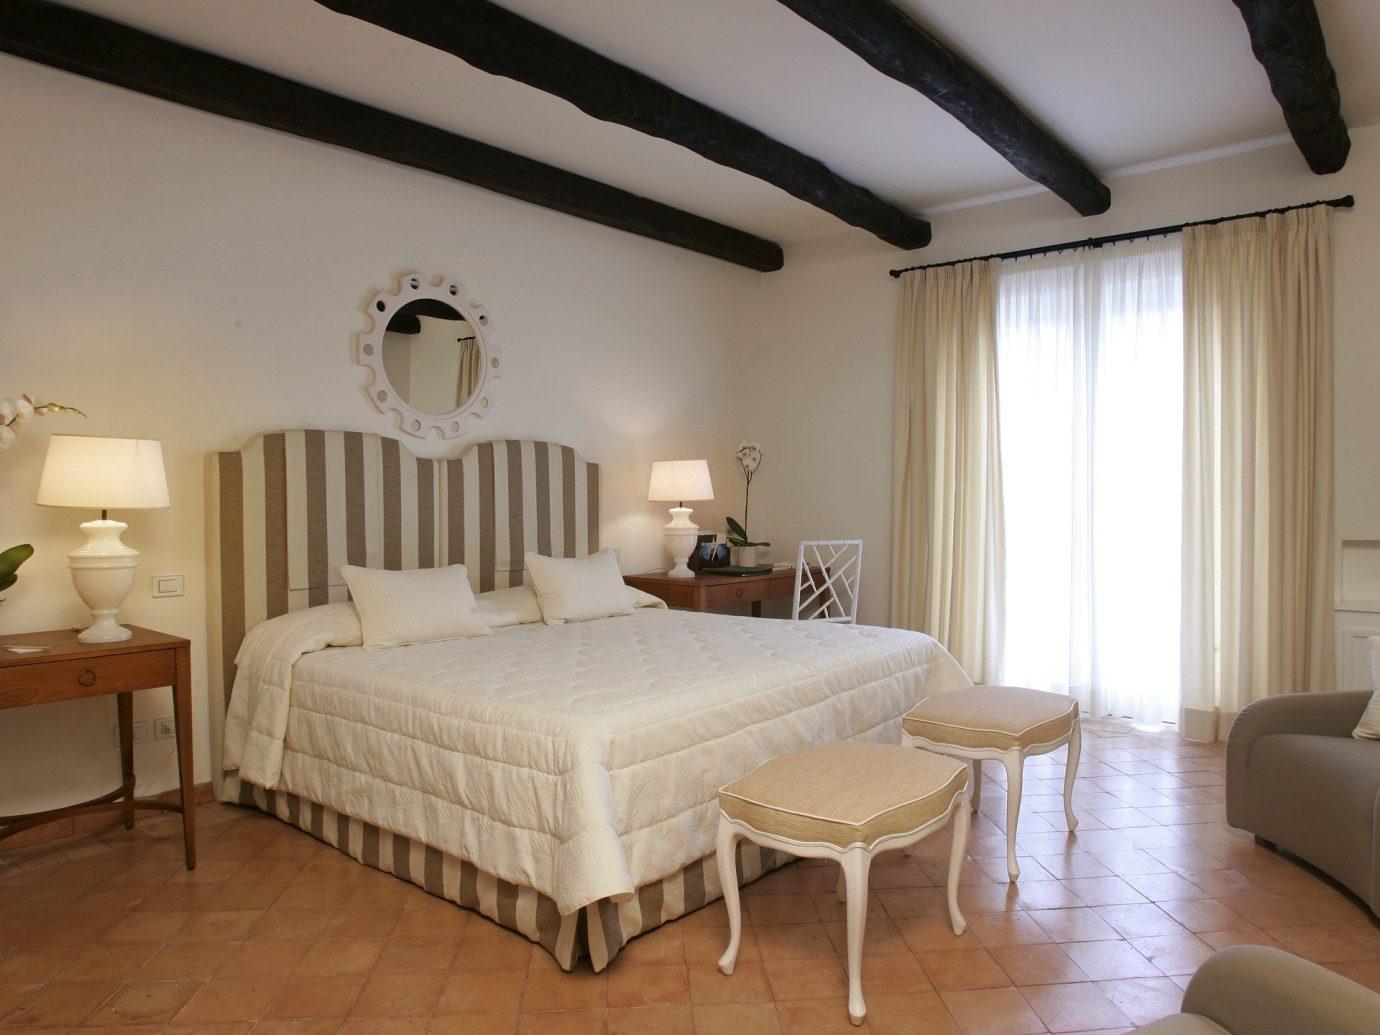 Hotels Luxury Travel floor indoor wall bed room Bedroom property Suite hotel interior design ceiling estate cottage real estate Villa wood furniture